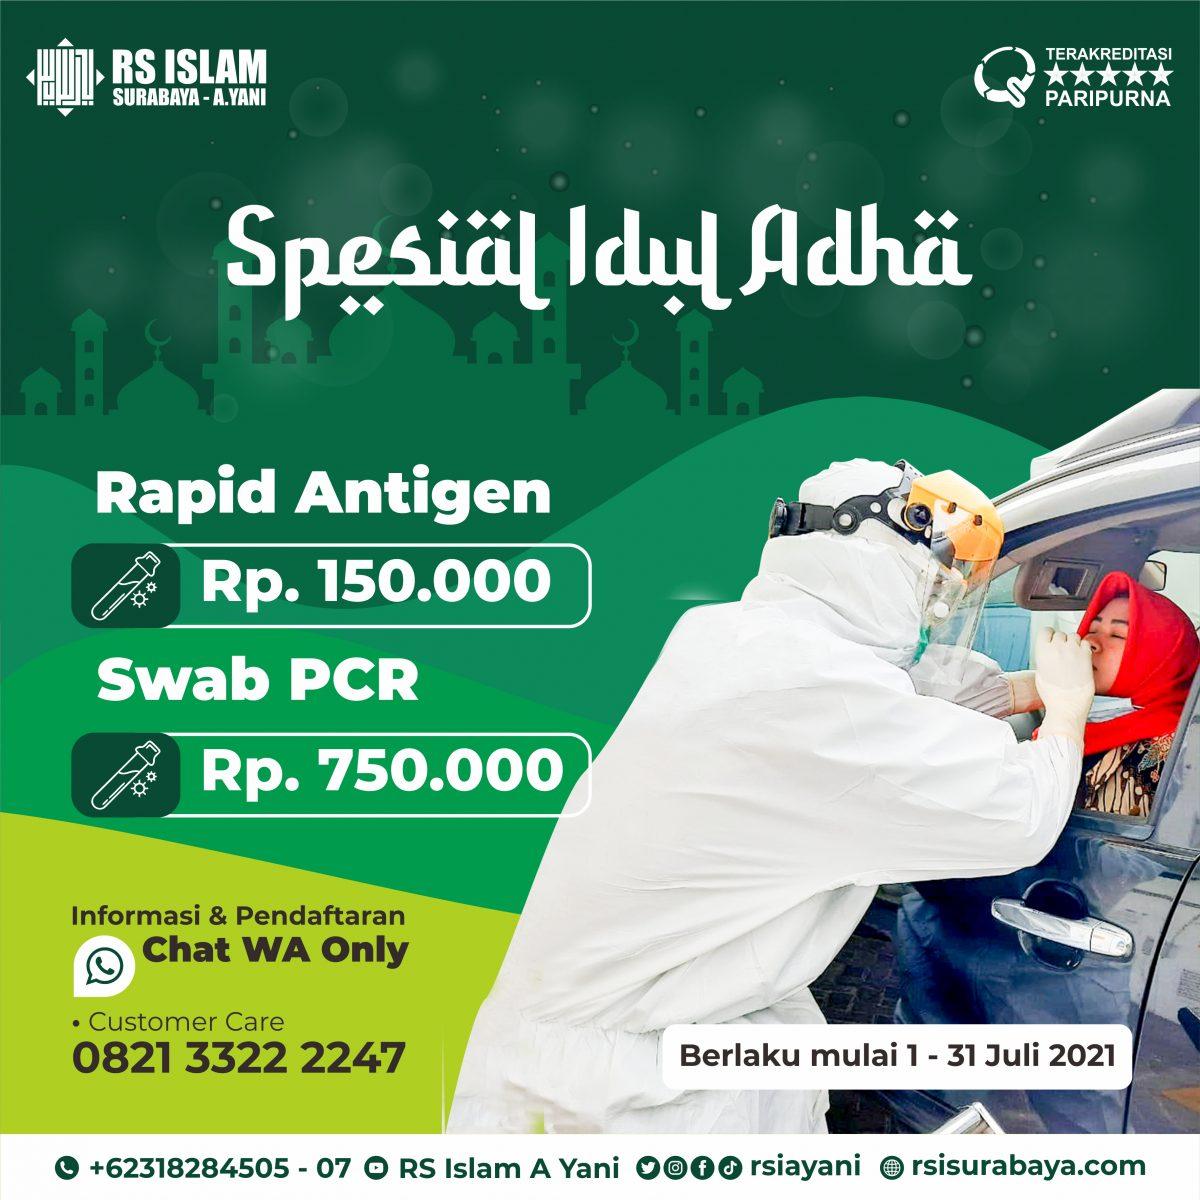 Spesial-Idul-Adha-1-1200x1200.jpg